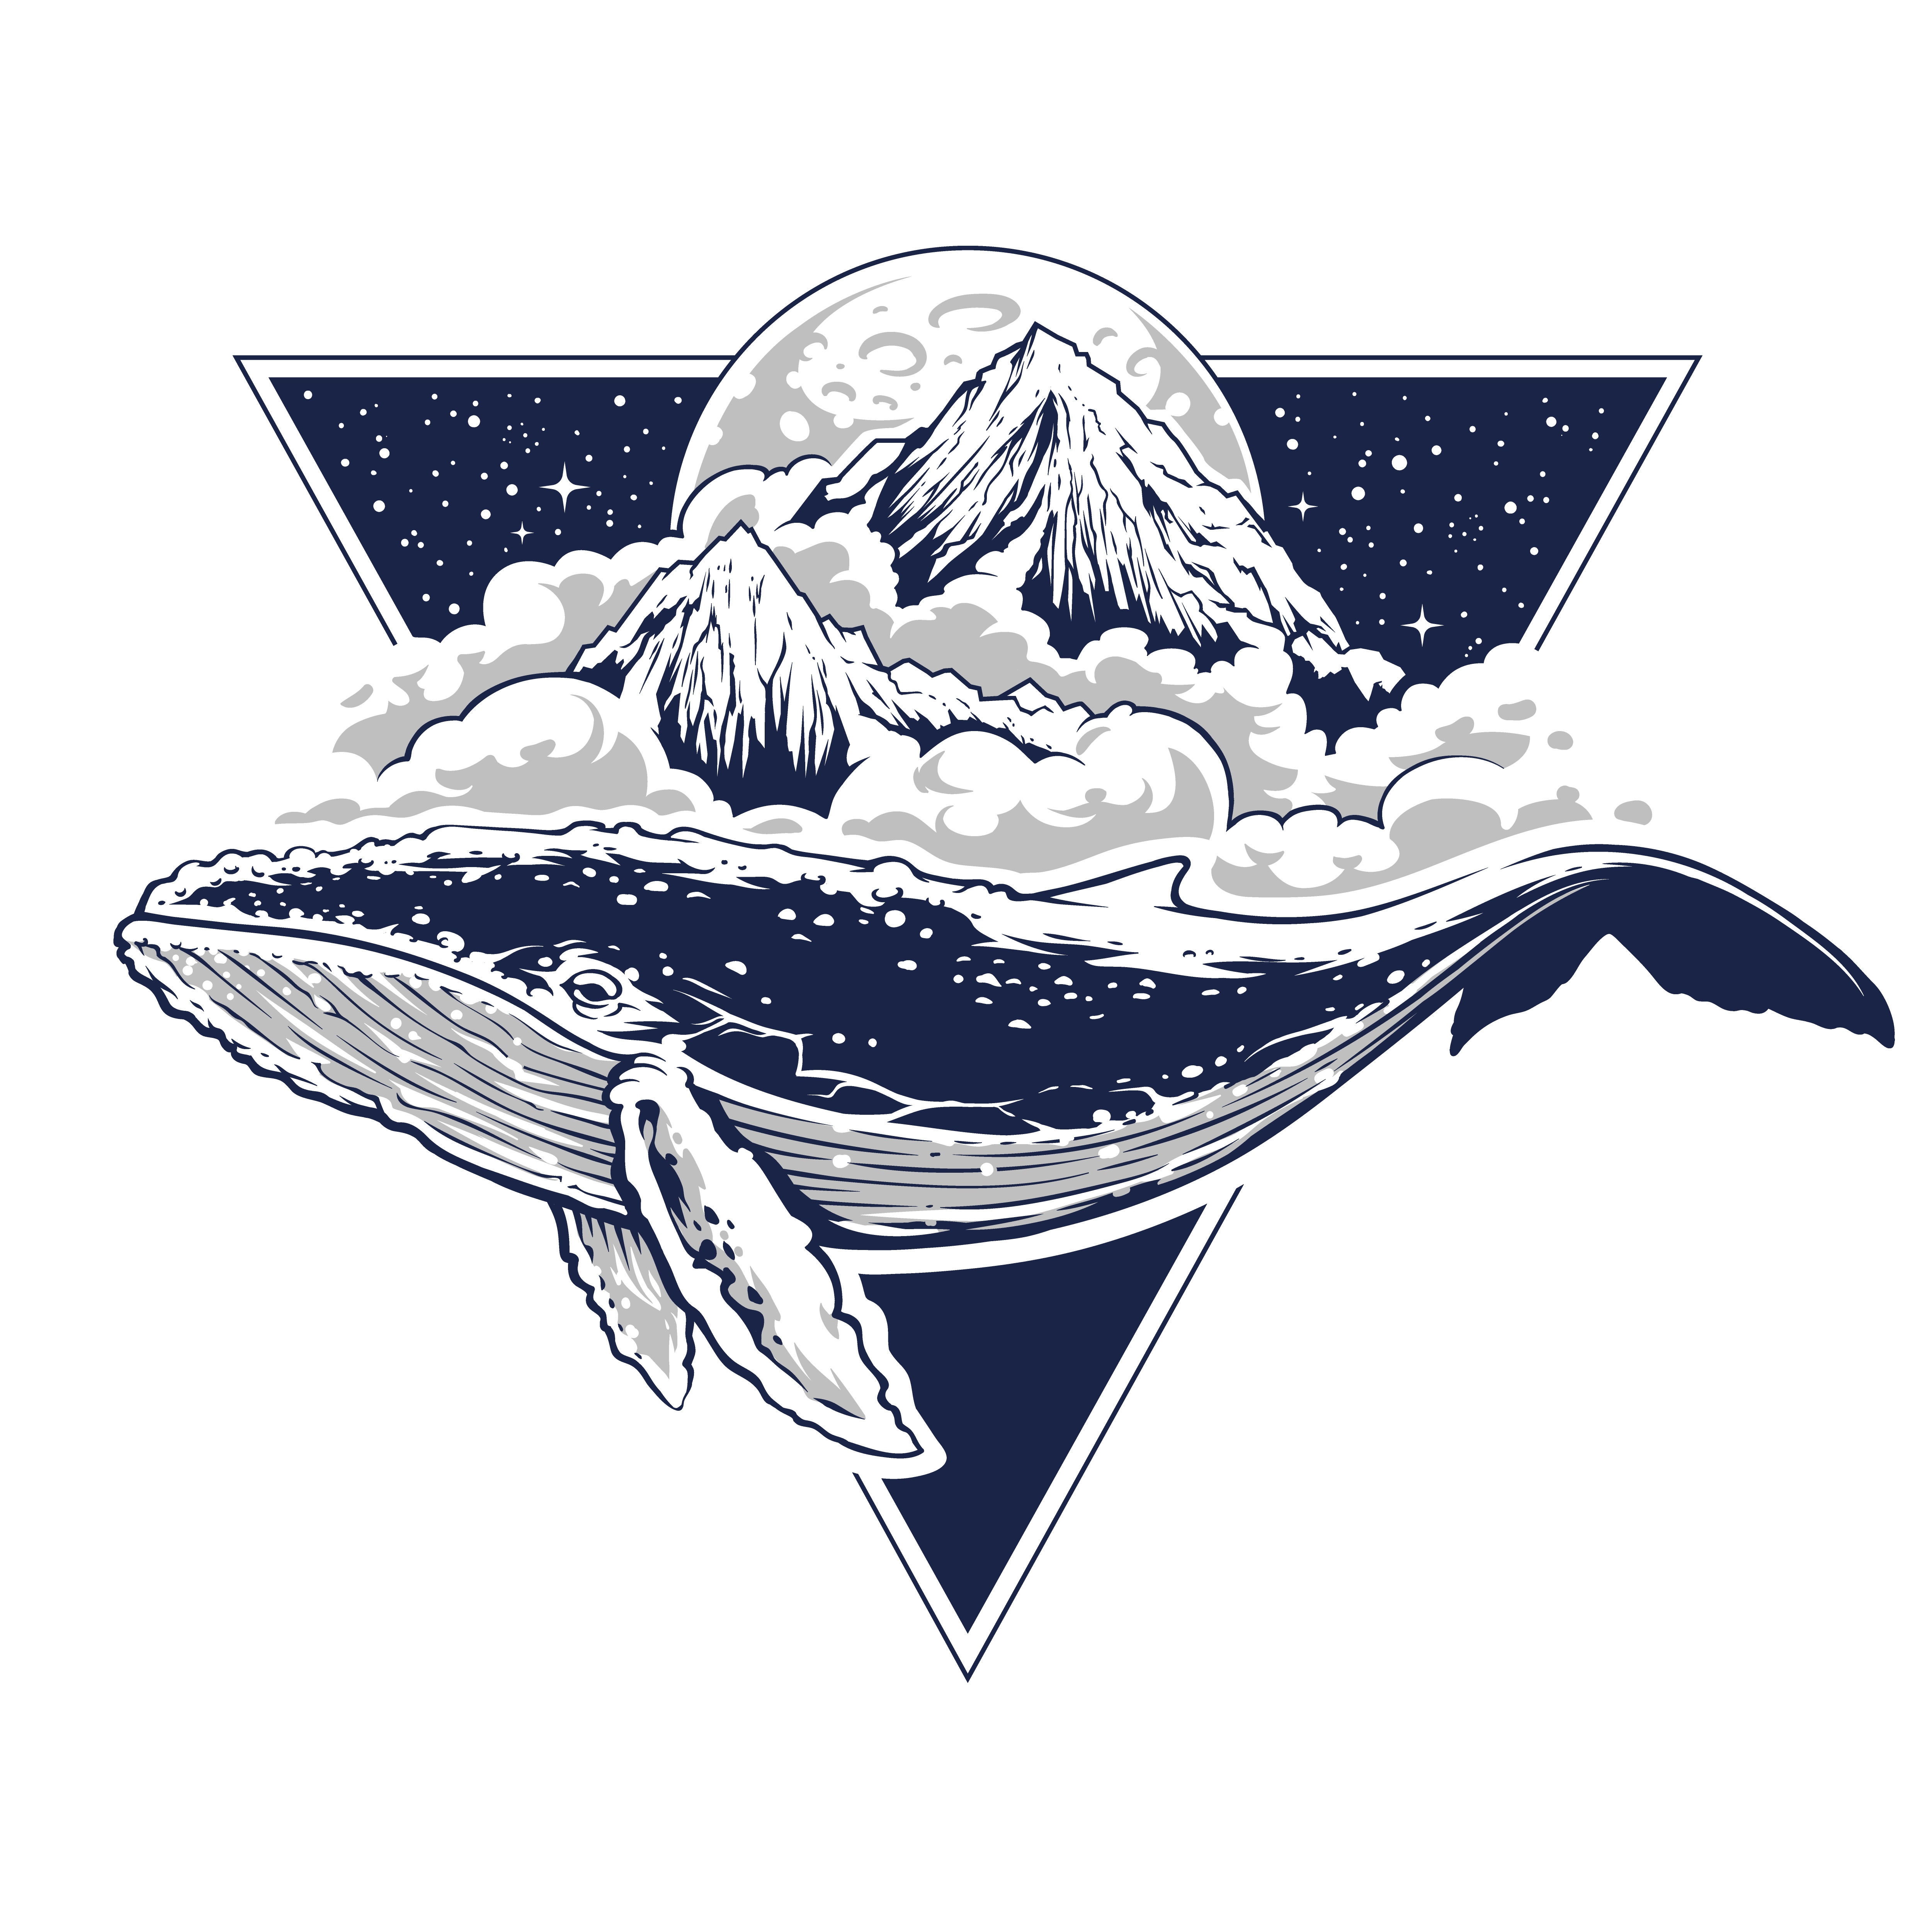 Whale Surreal Vector Art - Download Free Vector Art, Stock ...